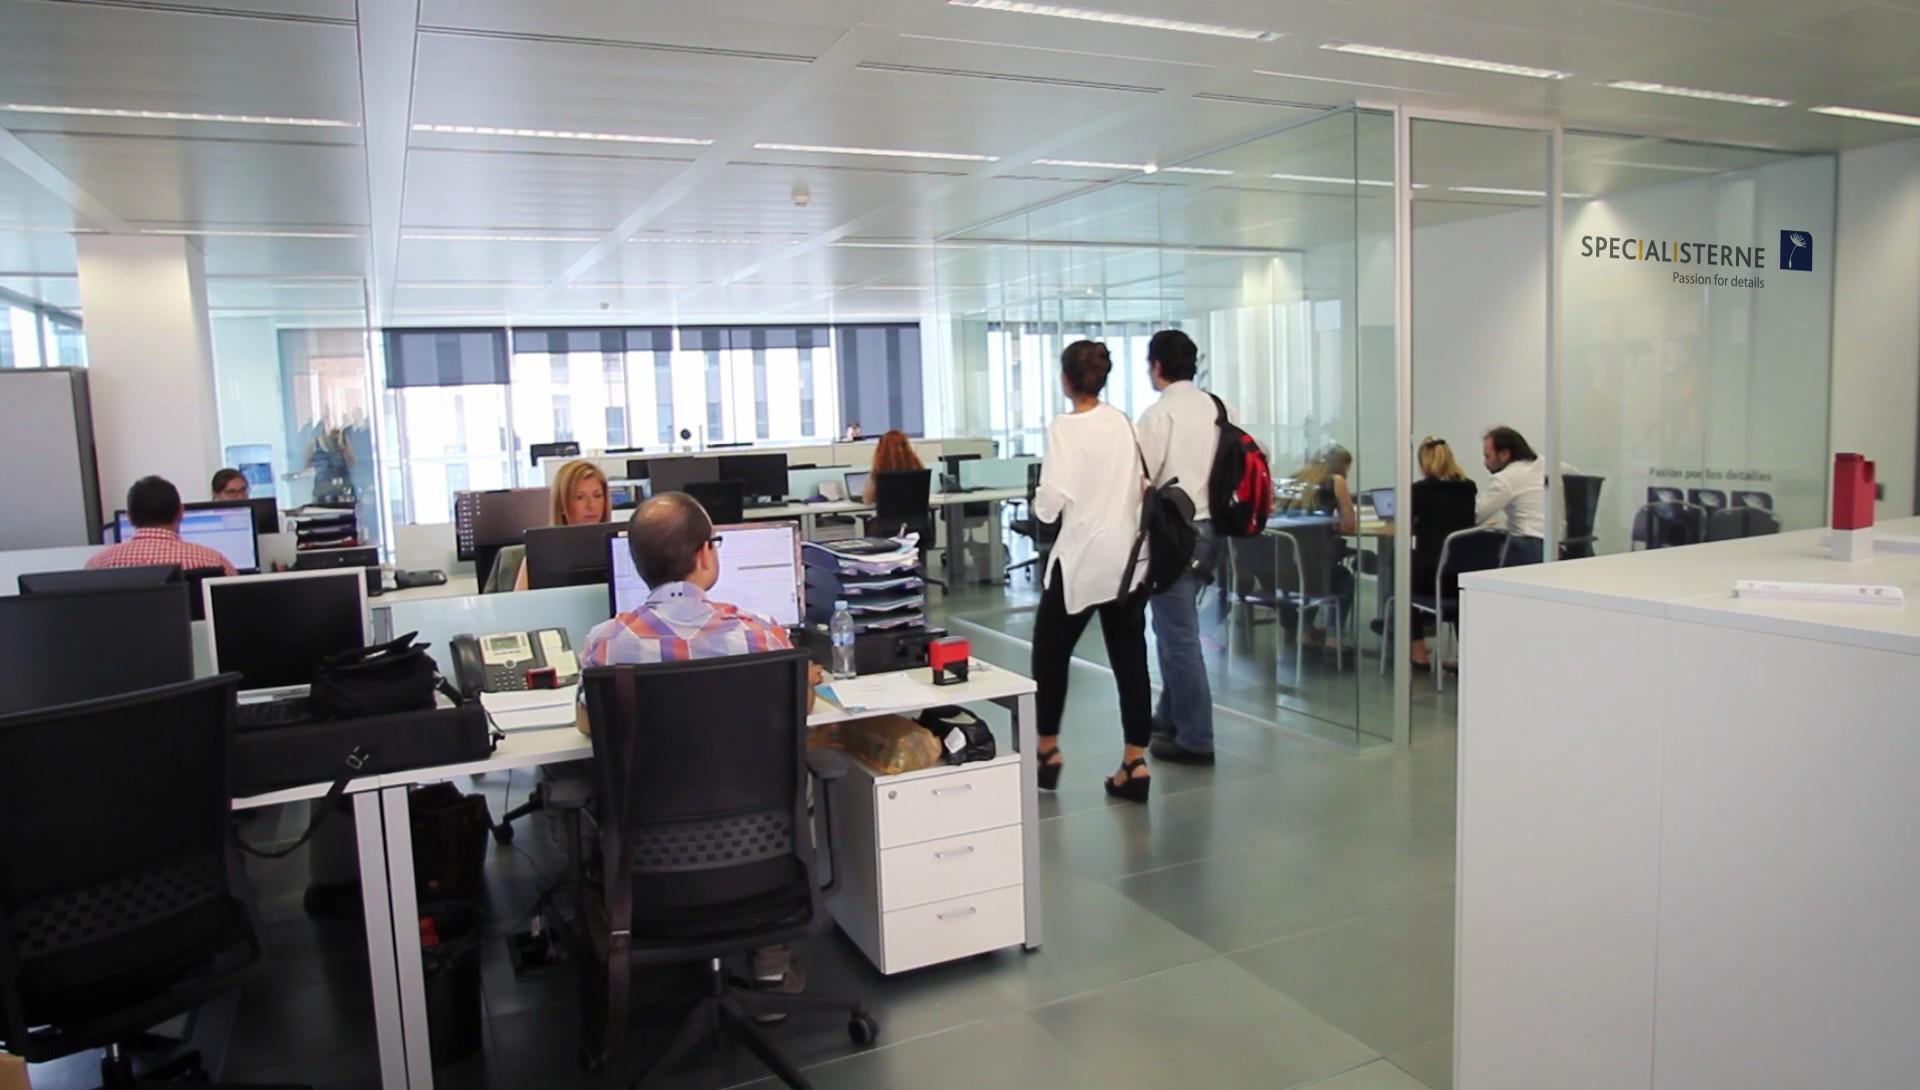 oficina-specialisterne.jpg